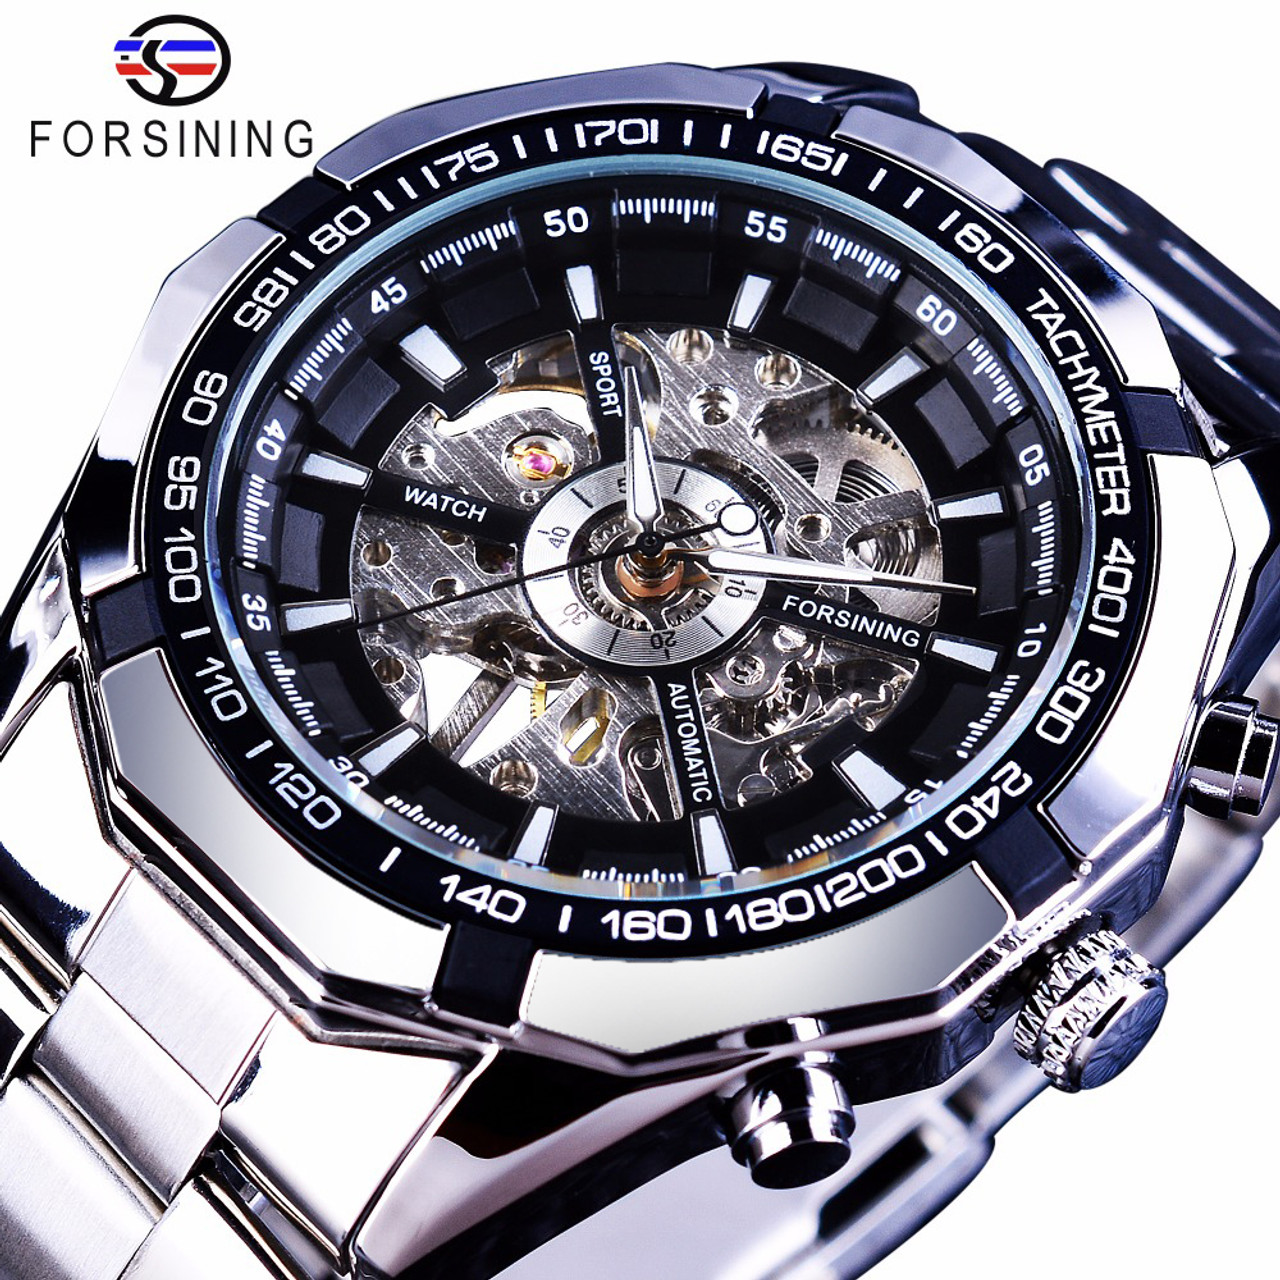 2018 Winner Classic Golden Skeleton Mechanical Watch Men Leather Strap Top Brand Luxury Man Business Vip Drop Shipping Wholesale Men's Watches